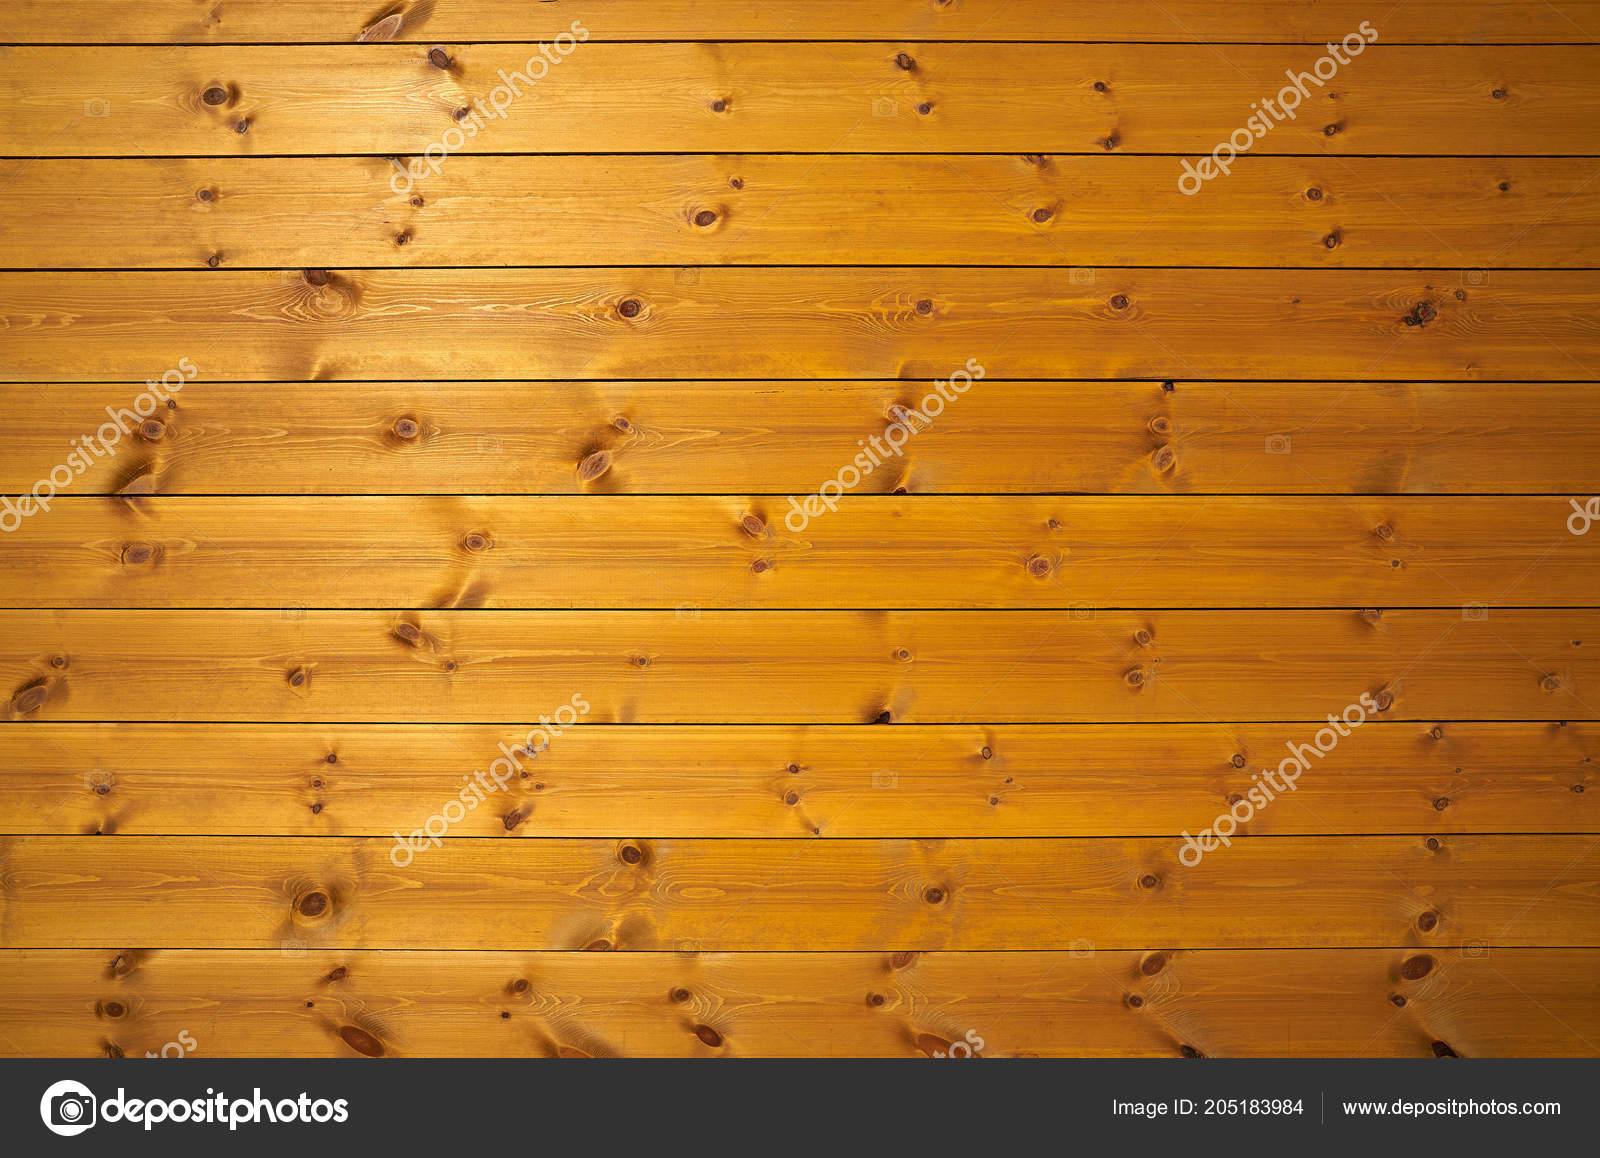 Grenen hout gouden warme kleur plaking bestuur u stockfoto